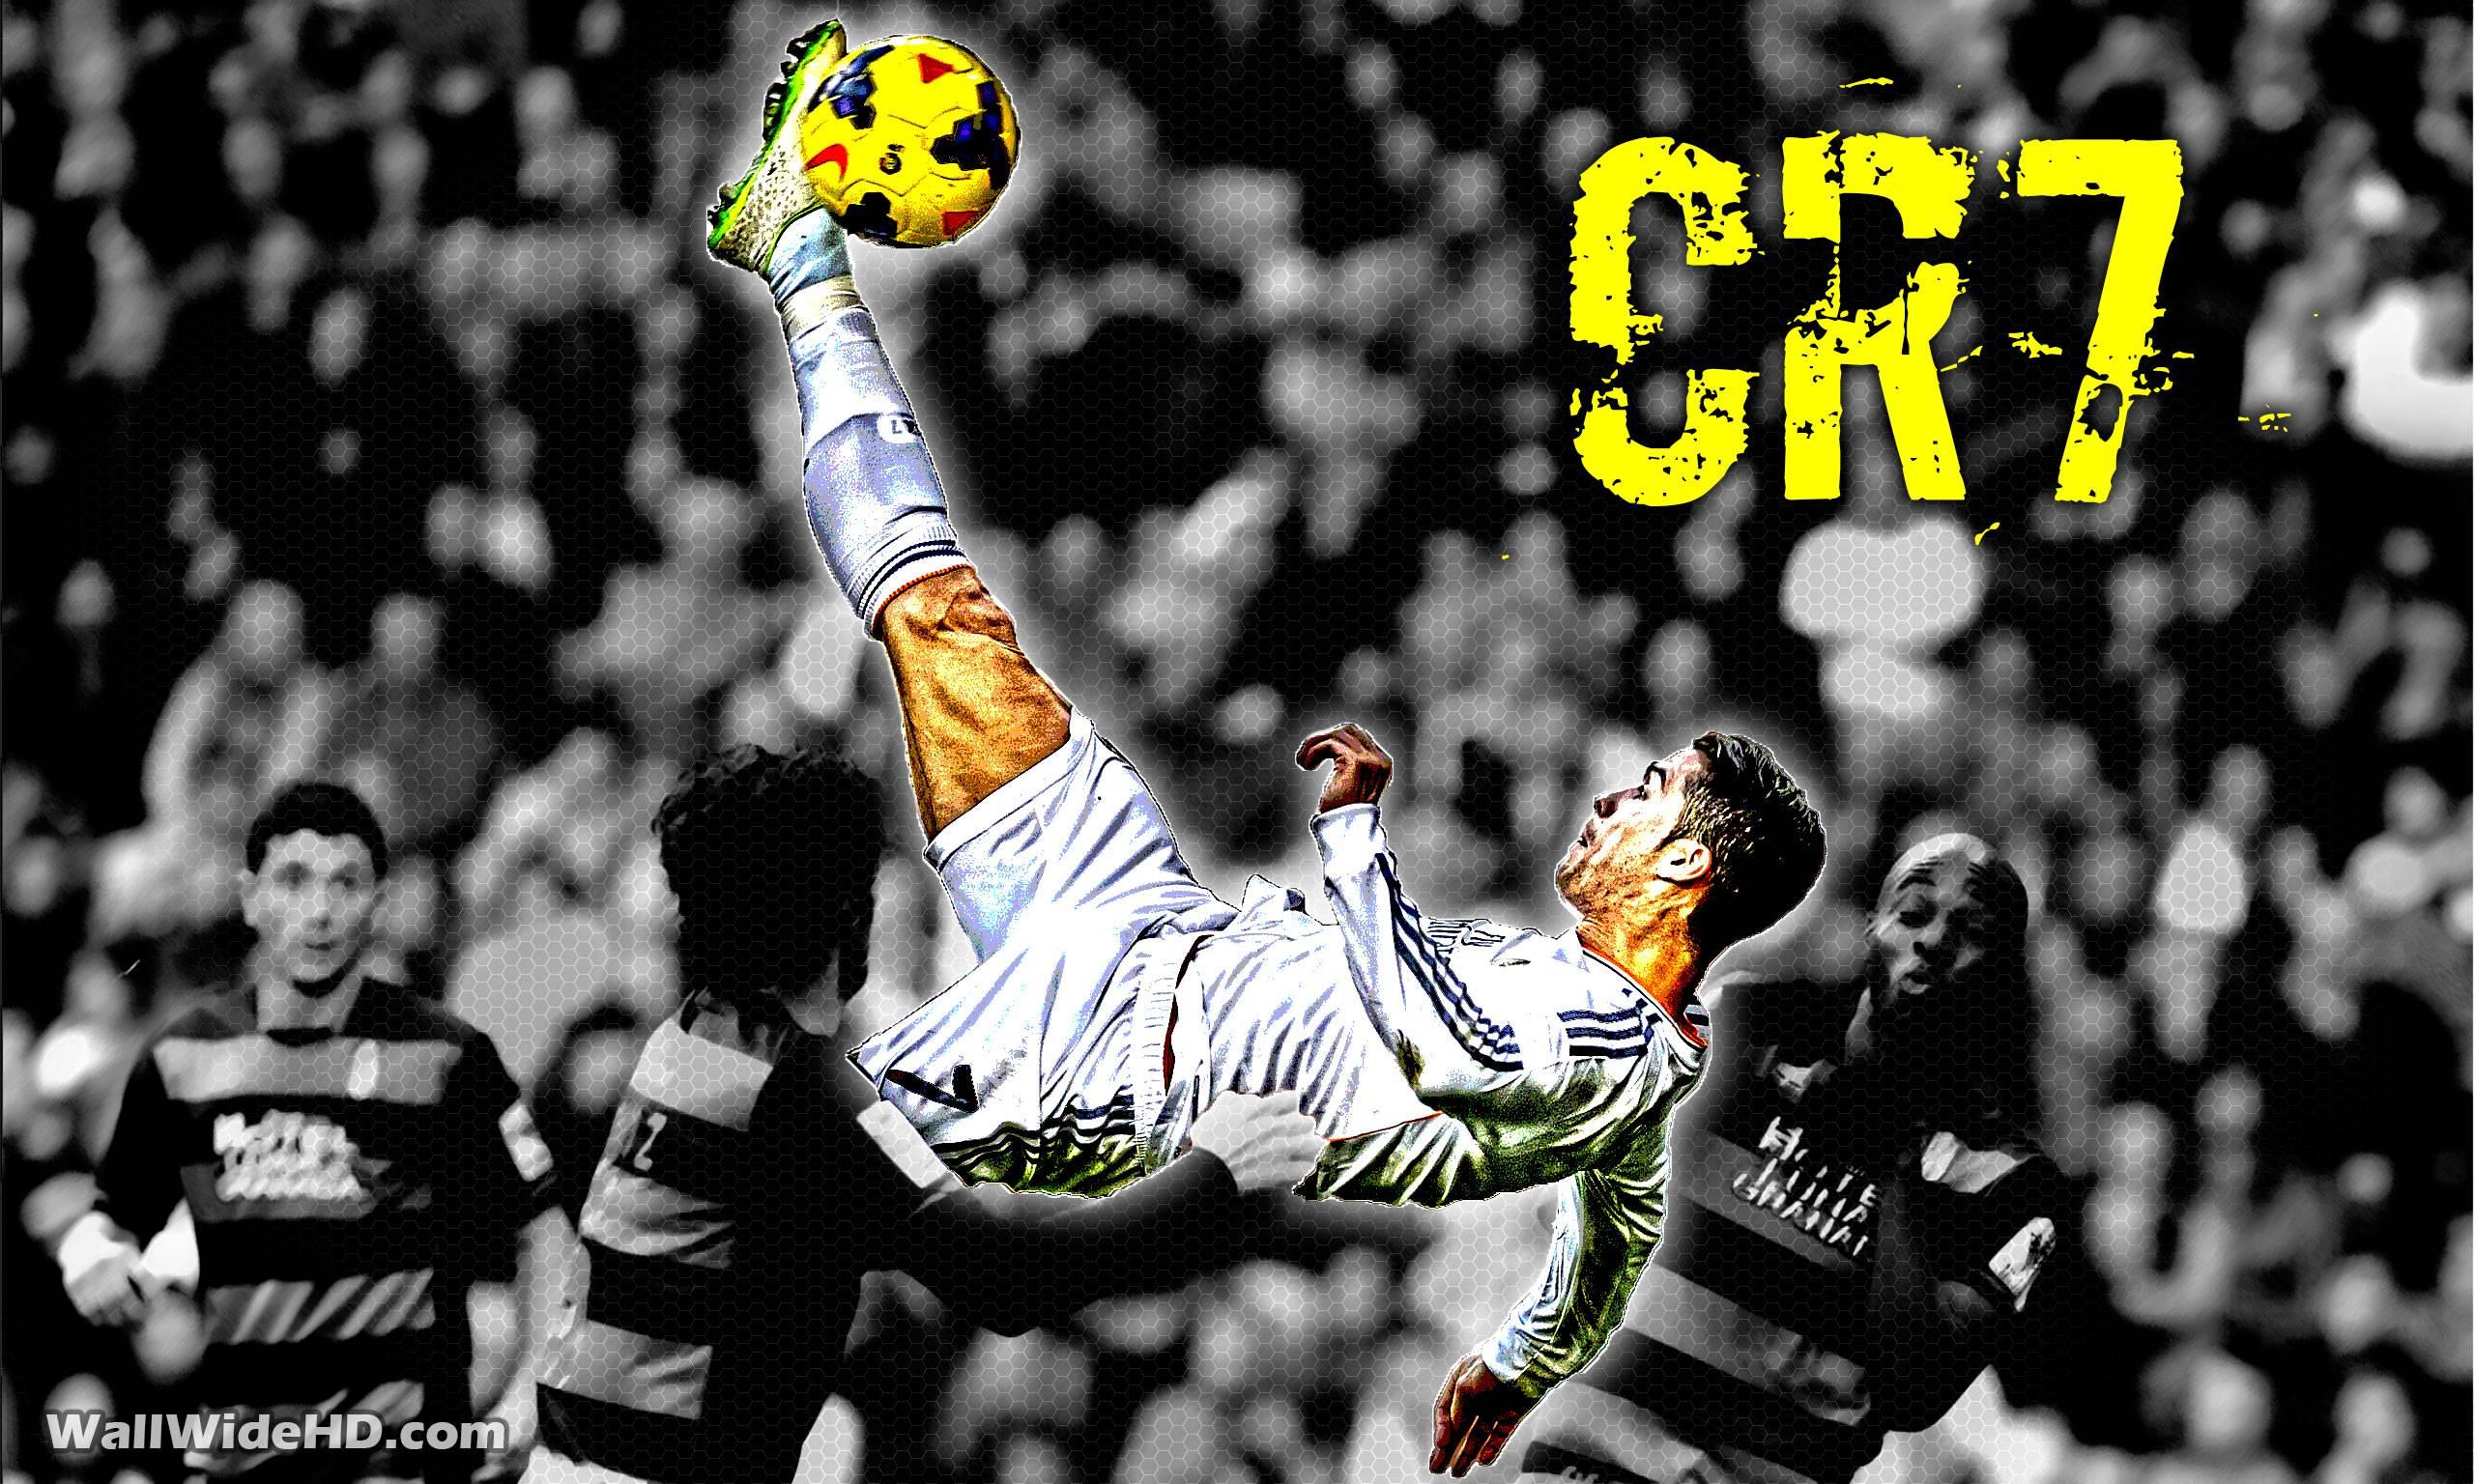 Ronaldo Football Wallpapers HD PixelsTalk Cristiano Real Madrid Wallpaper Sports In Jpg